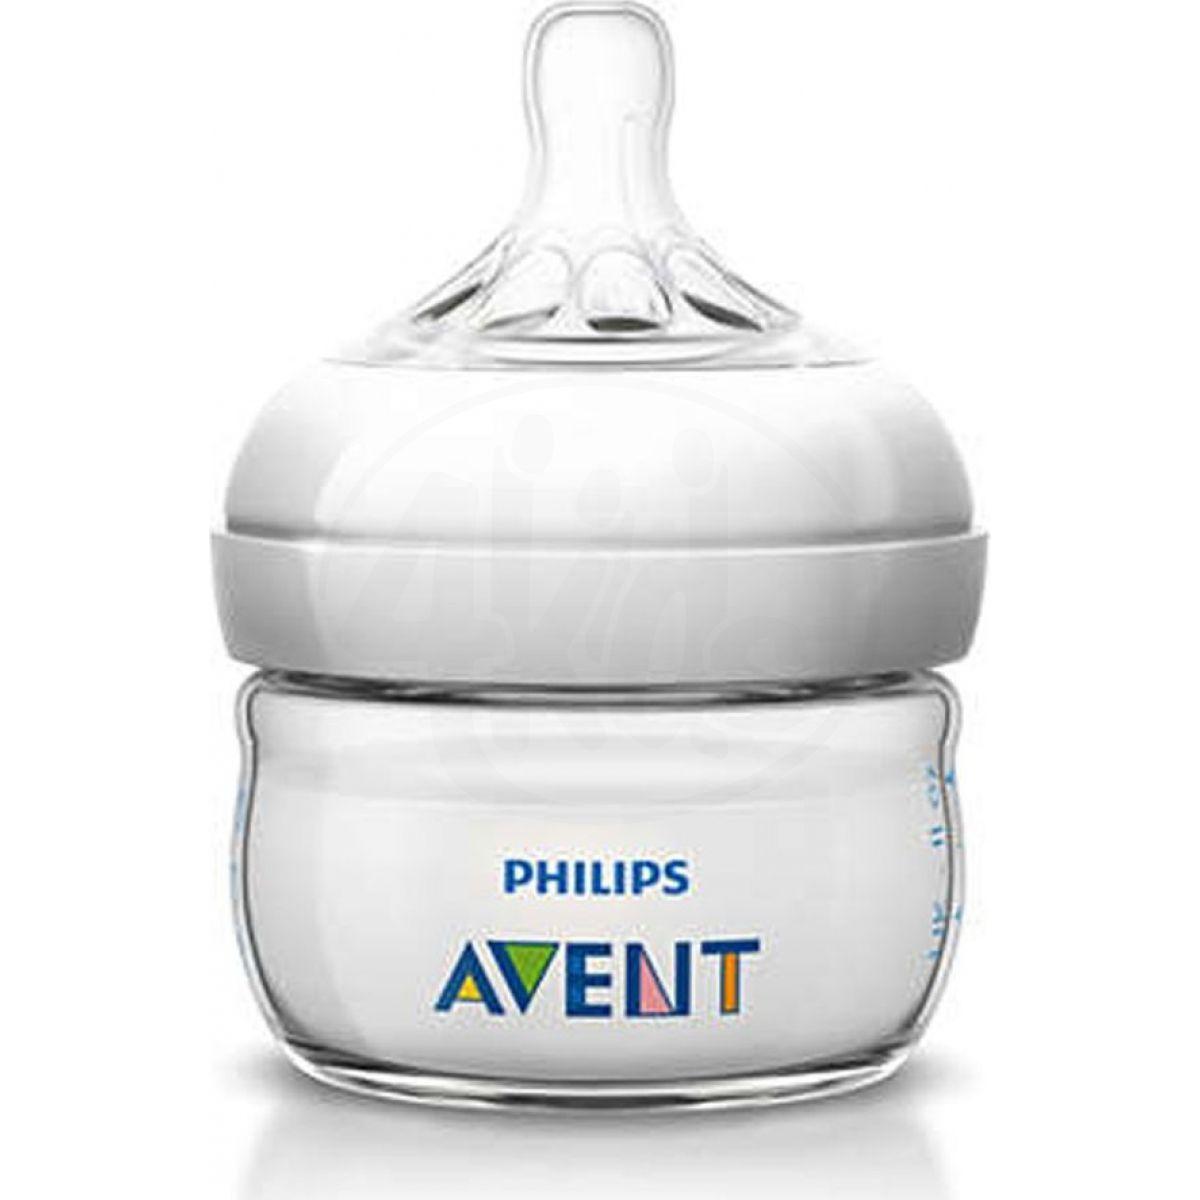 Philips Avent láhev Natural PP 60 ml průhlédná bílá 1 ks